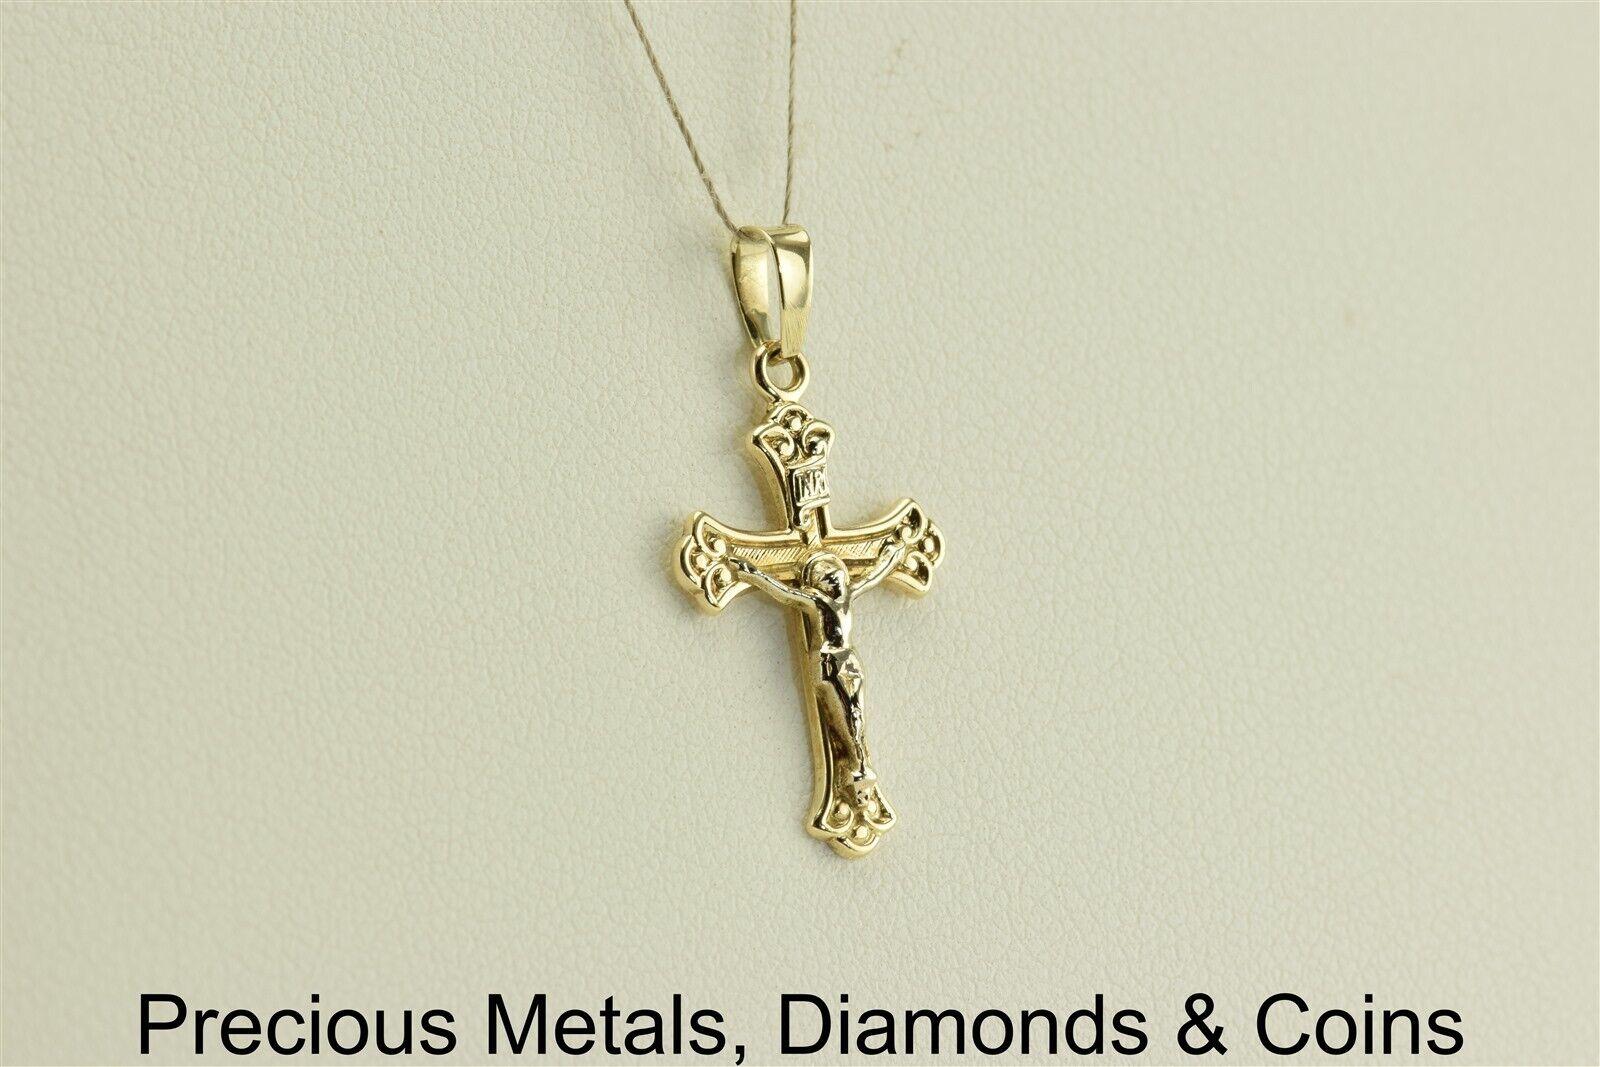 14k Yellow gold 22mm x 13mm Crucifix Cross Pendant